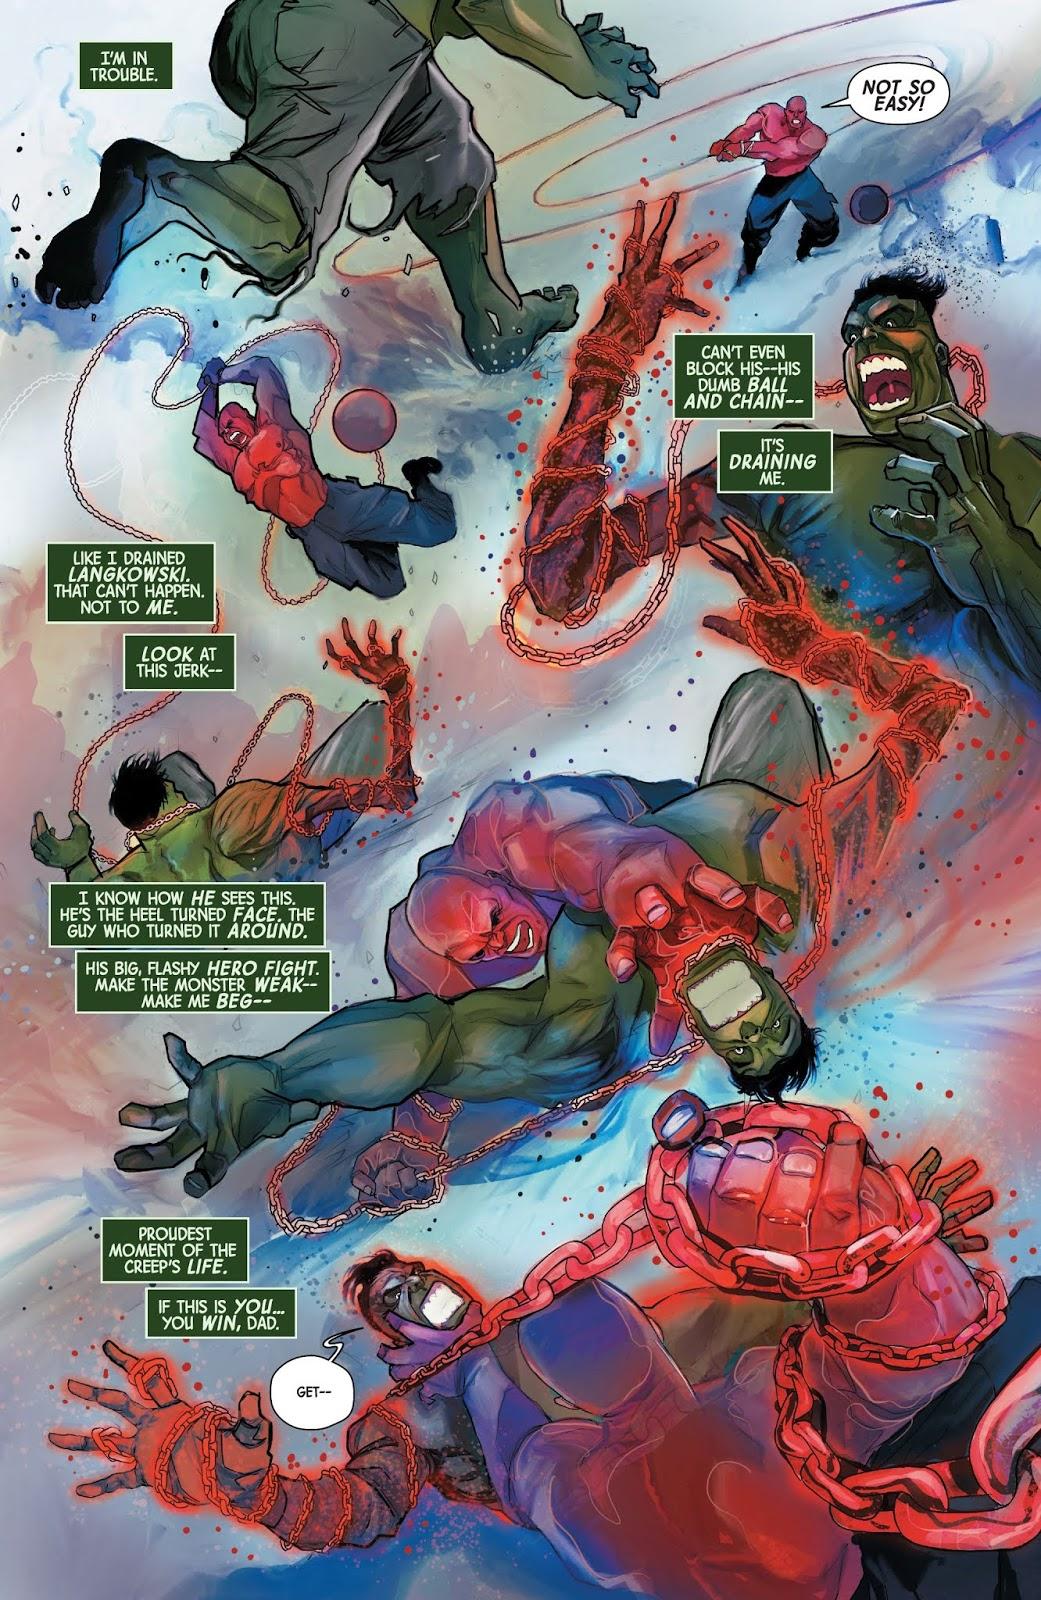 The Immortal Hulk VS The Absorbing Man